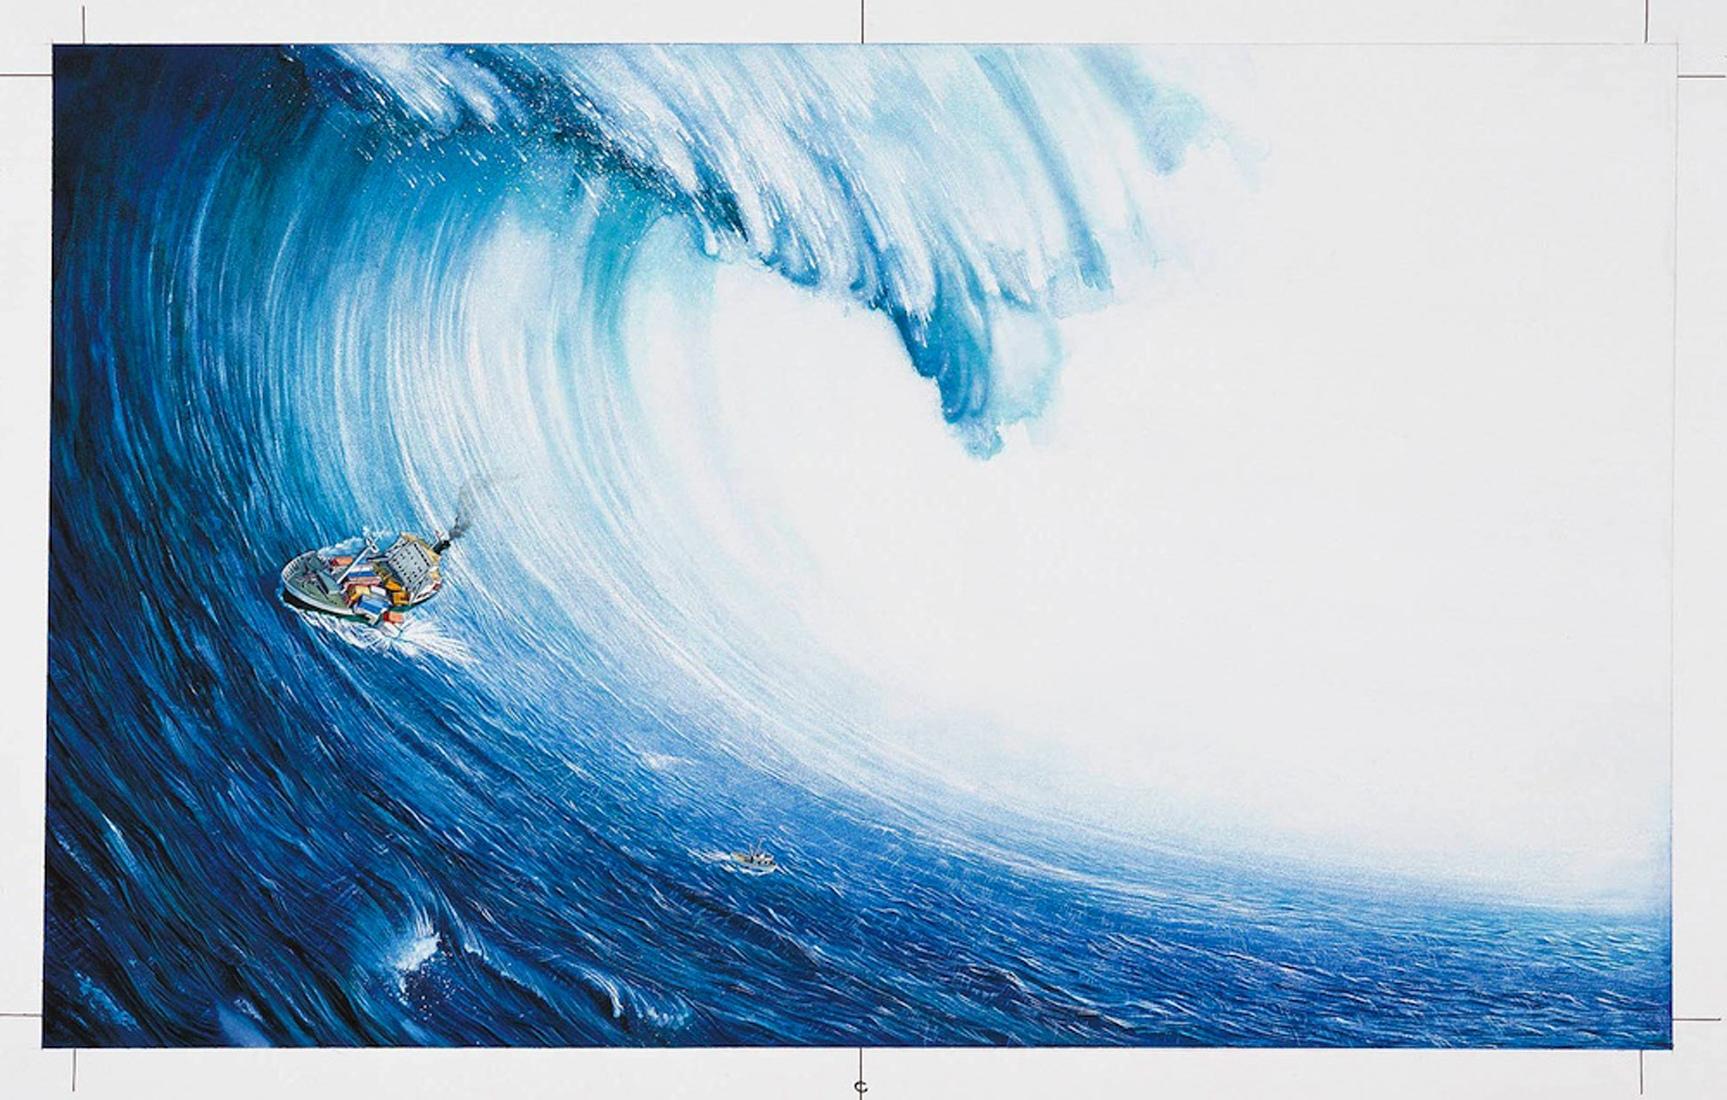 Tsunami-wave-WO-1993